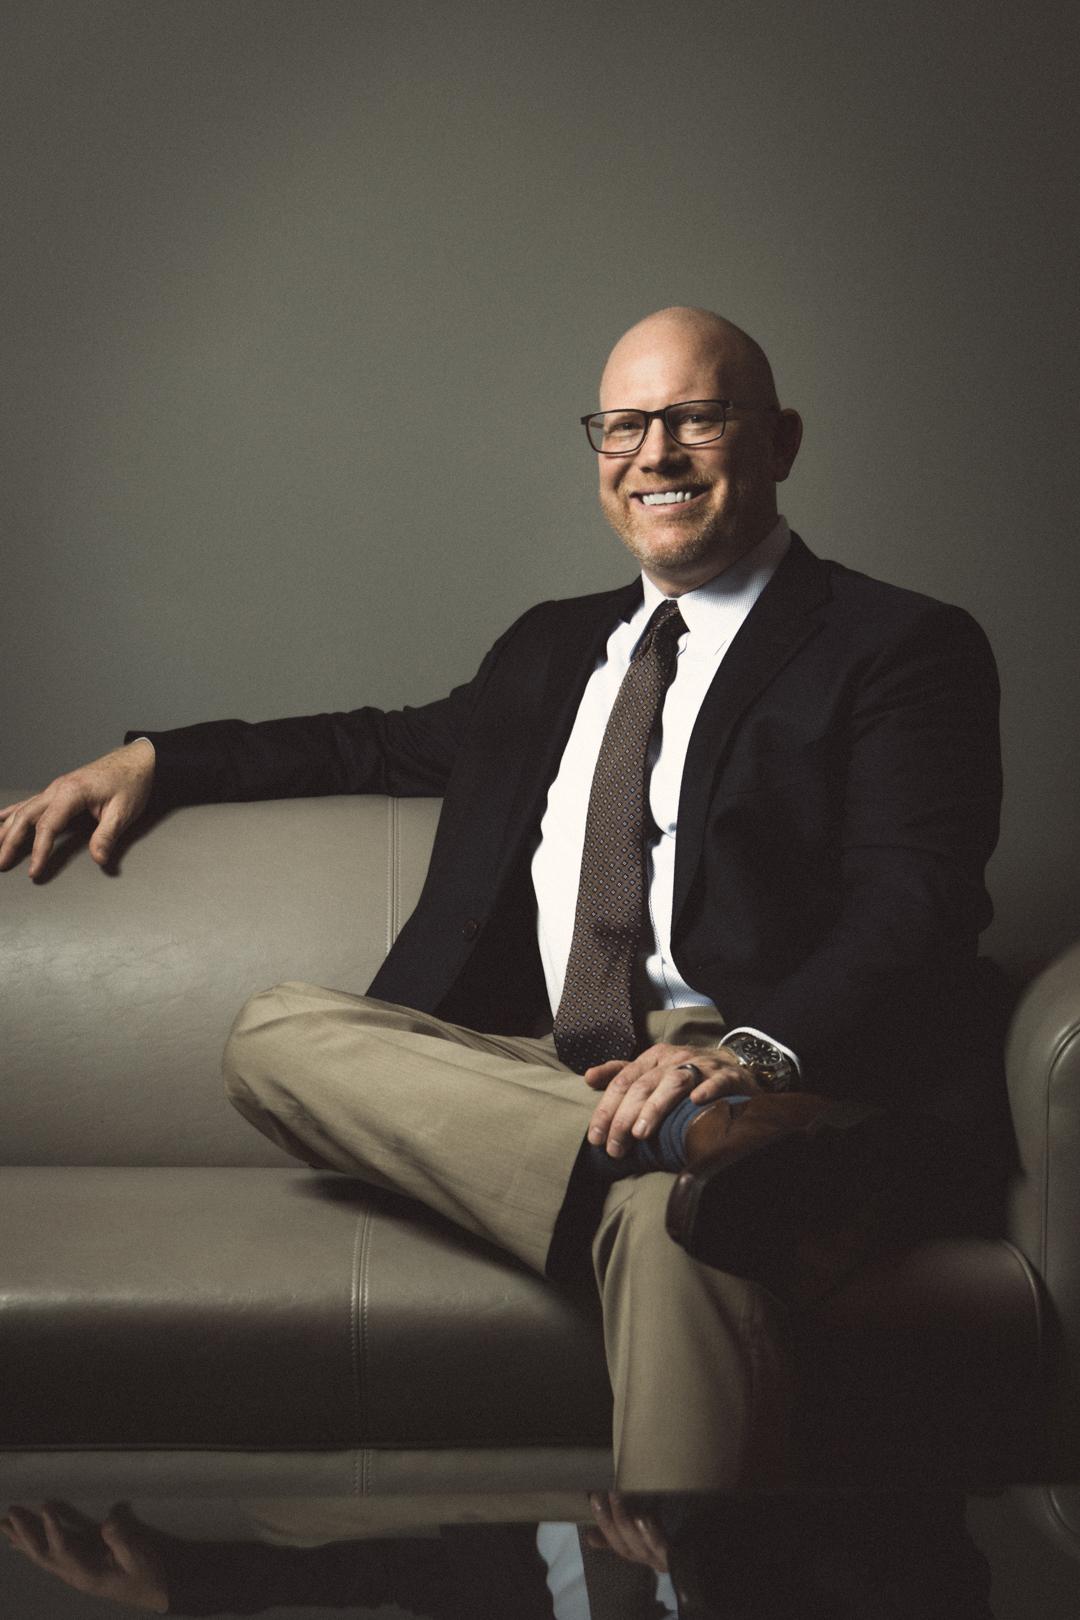 Scott Finlinson | 2019 Corporate Counsel